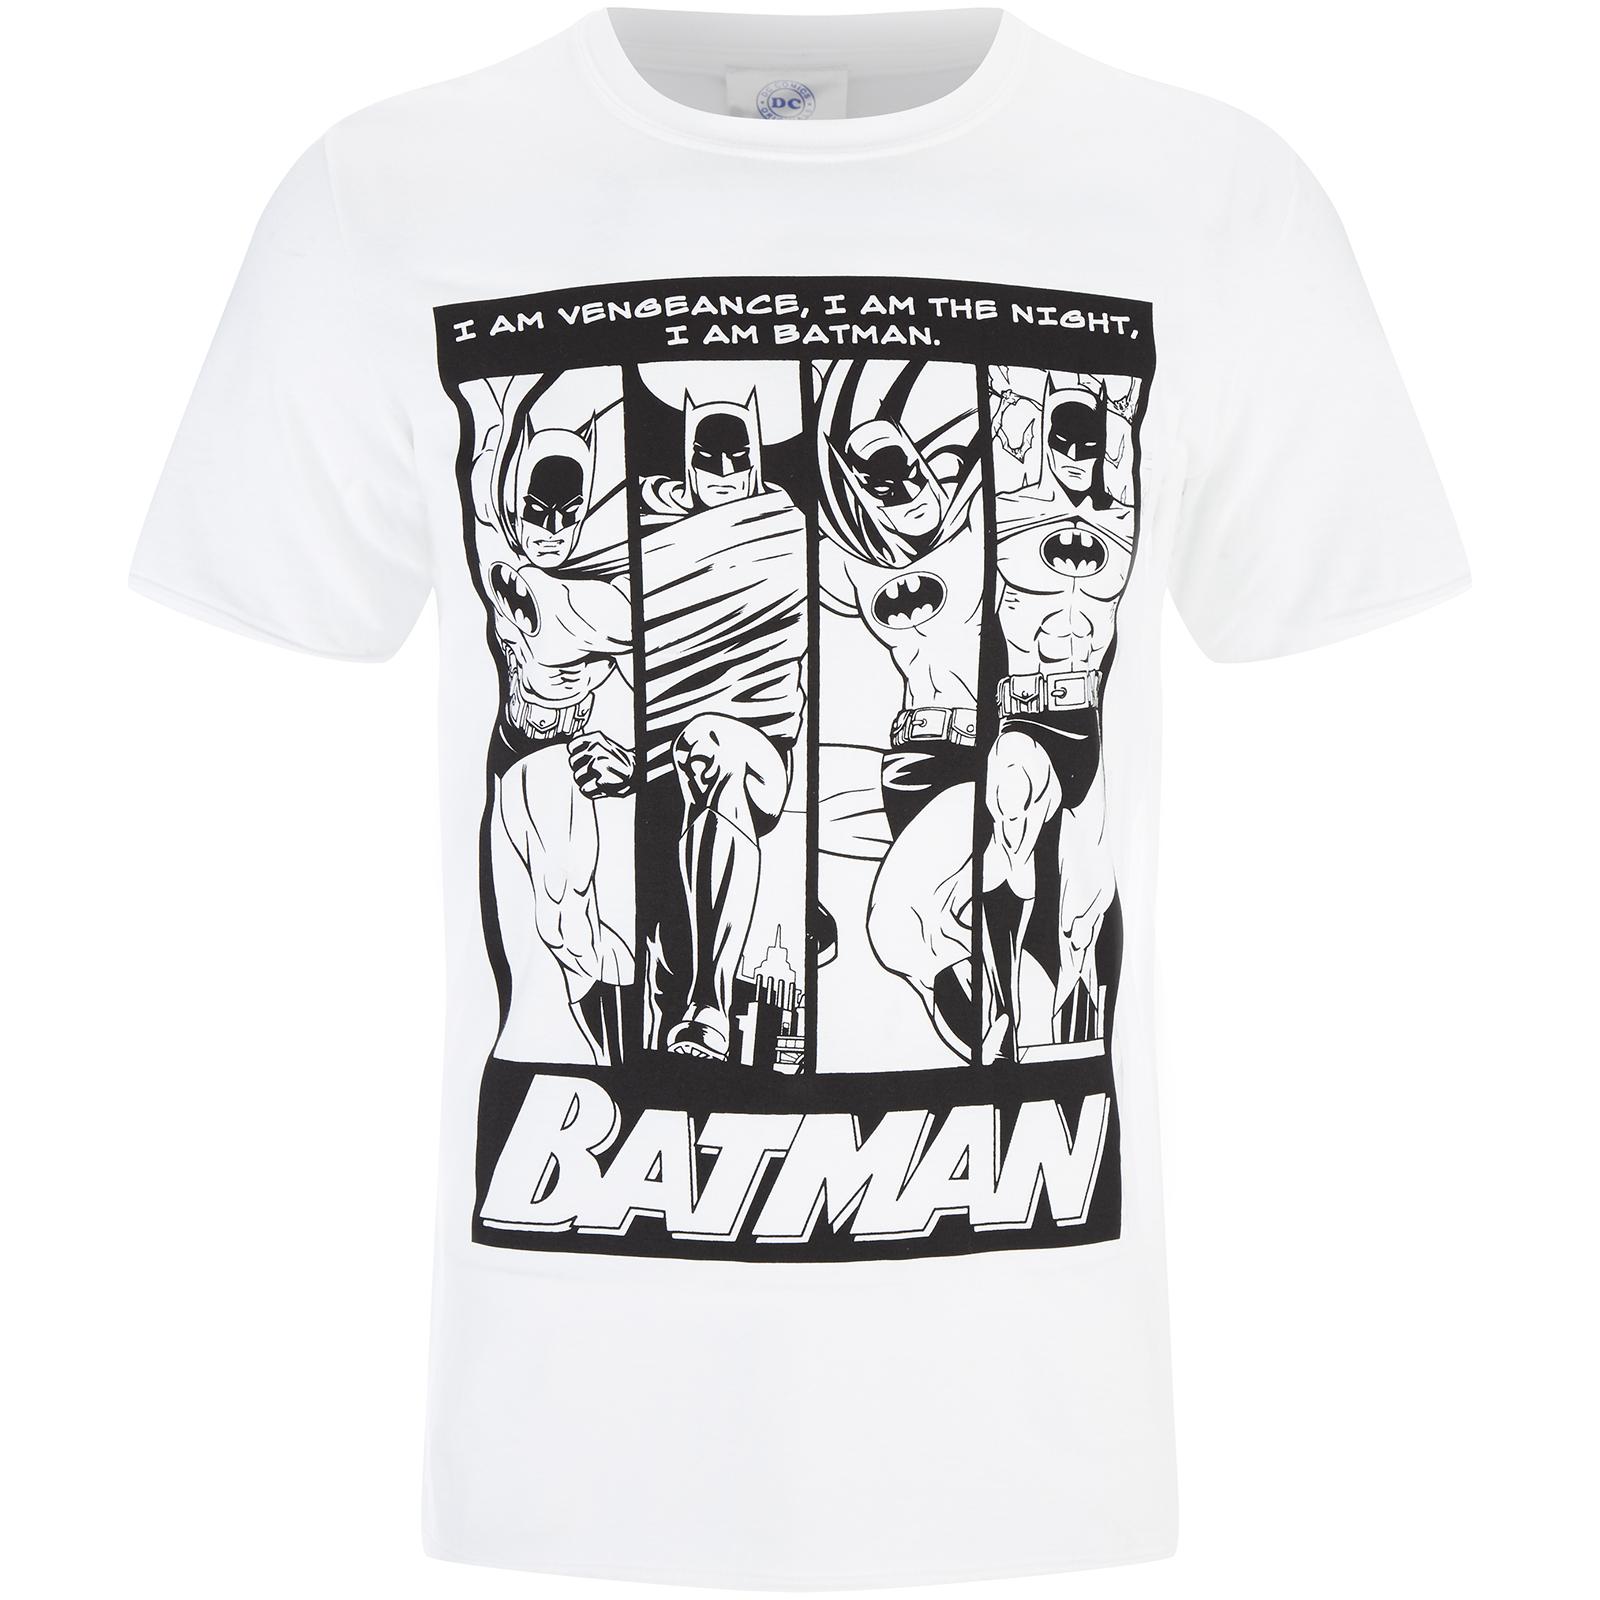 991191df2f DC Comics Men s Batman I am Batman T-Shirt - White Merchandise ...